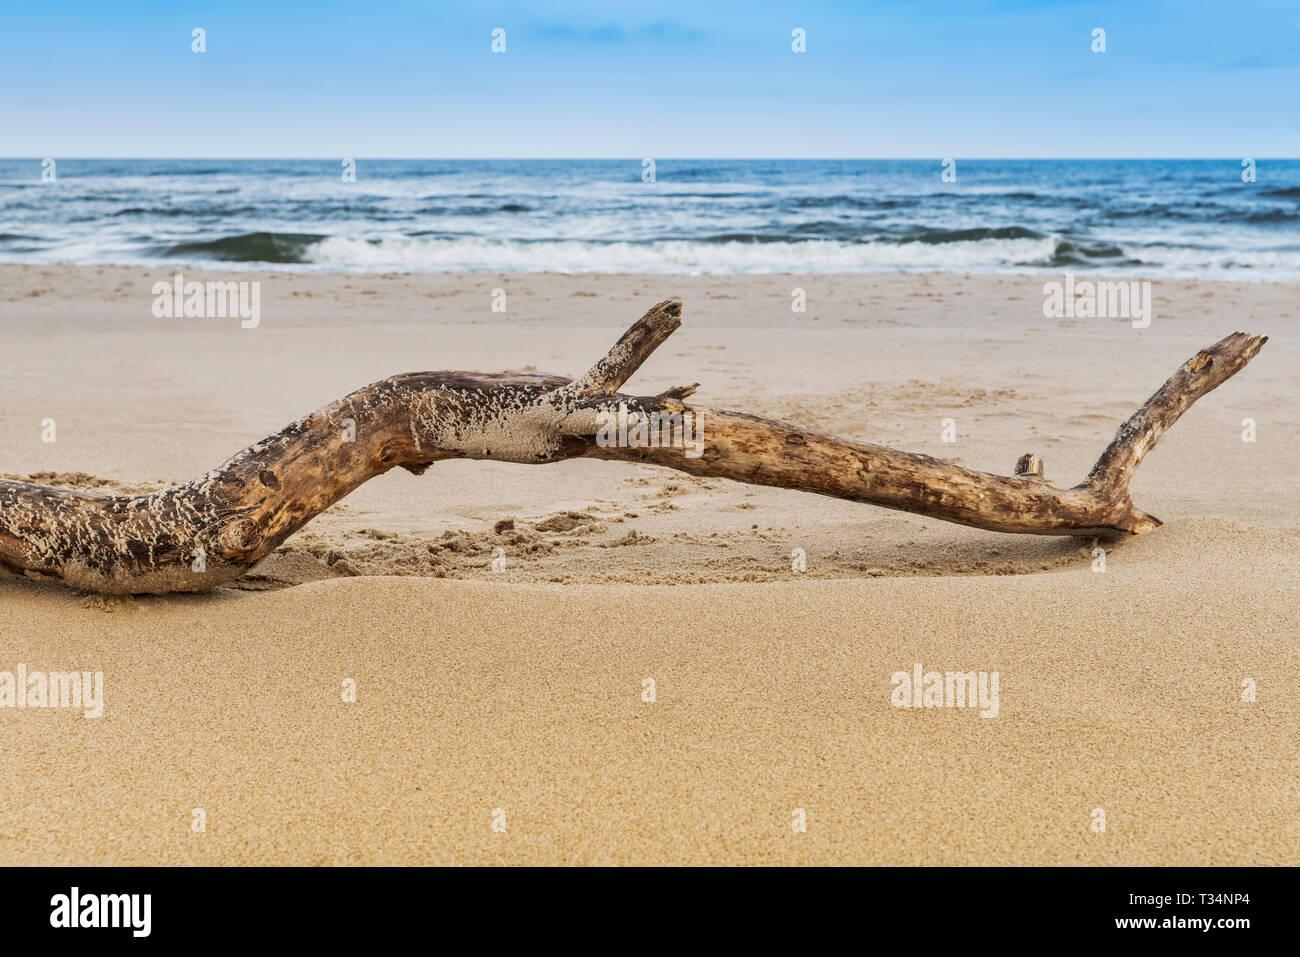 A tree branch lies on the beach of the Baltic Sea, Kolobrzeg, West Pomeranian, Poland, Europe - Stock Image